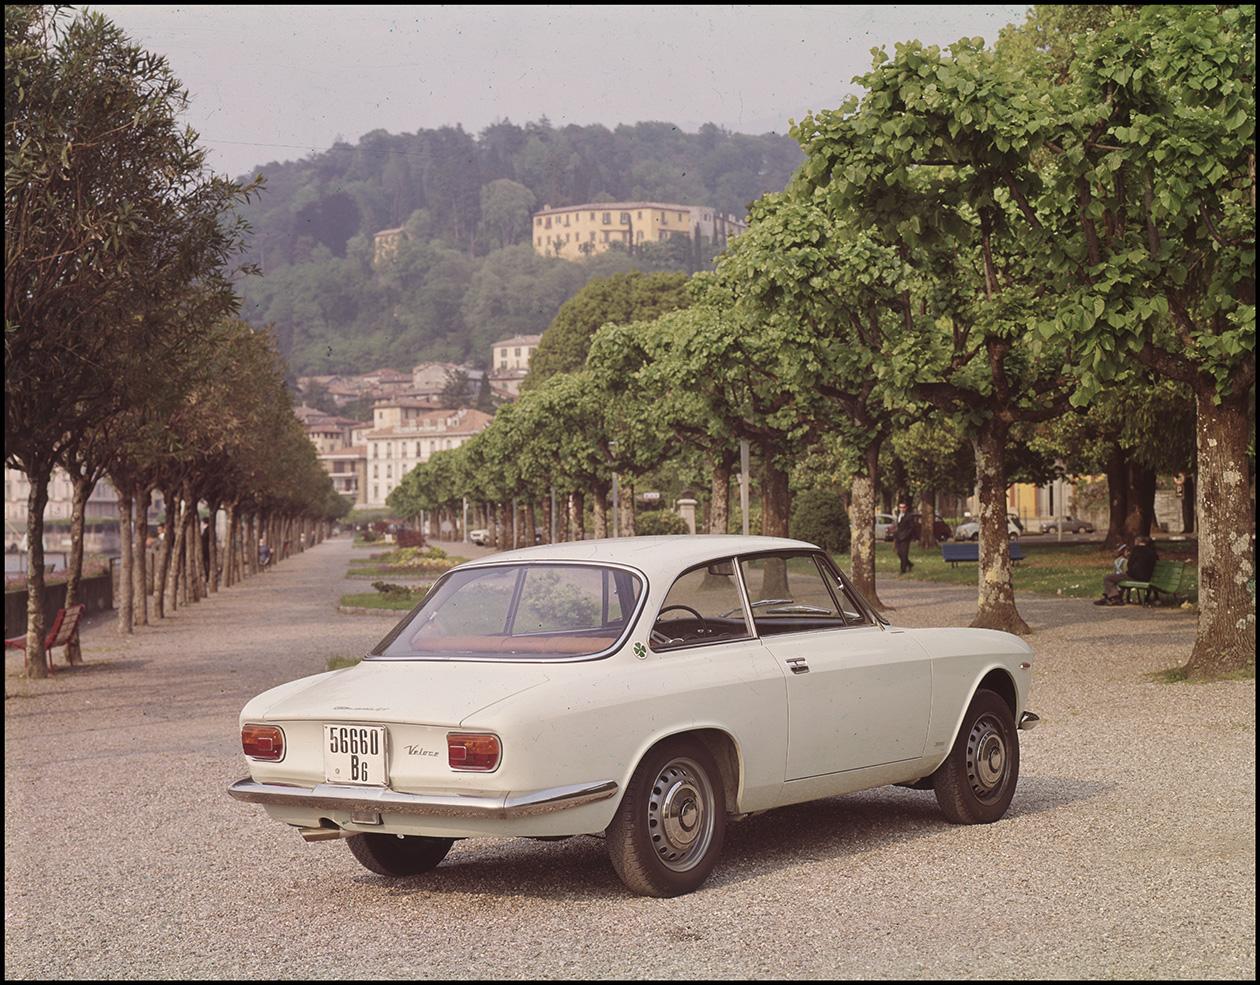 Giulia%2BSprint Δεν γνωρίζεις τι εστί Alfa Romeo άμα δεν γνωρίζεις την ιστορία της Alfa, alfa romeo, Alfa Romeo Soul, Alfisti, Giulia, Heritage, museoalfaromeo, videos, zblog